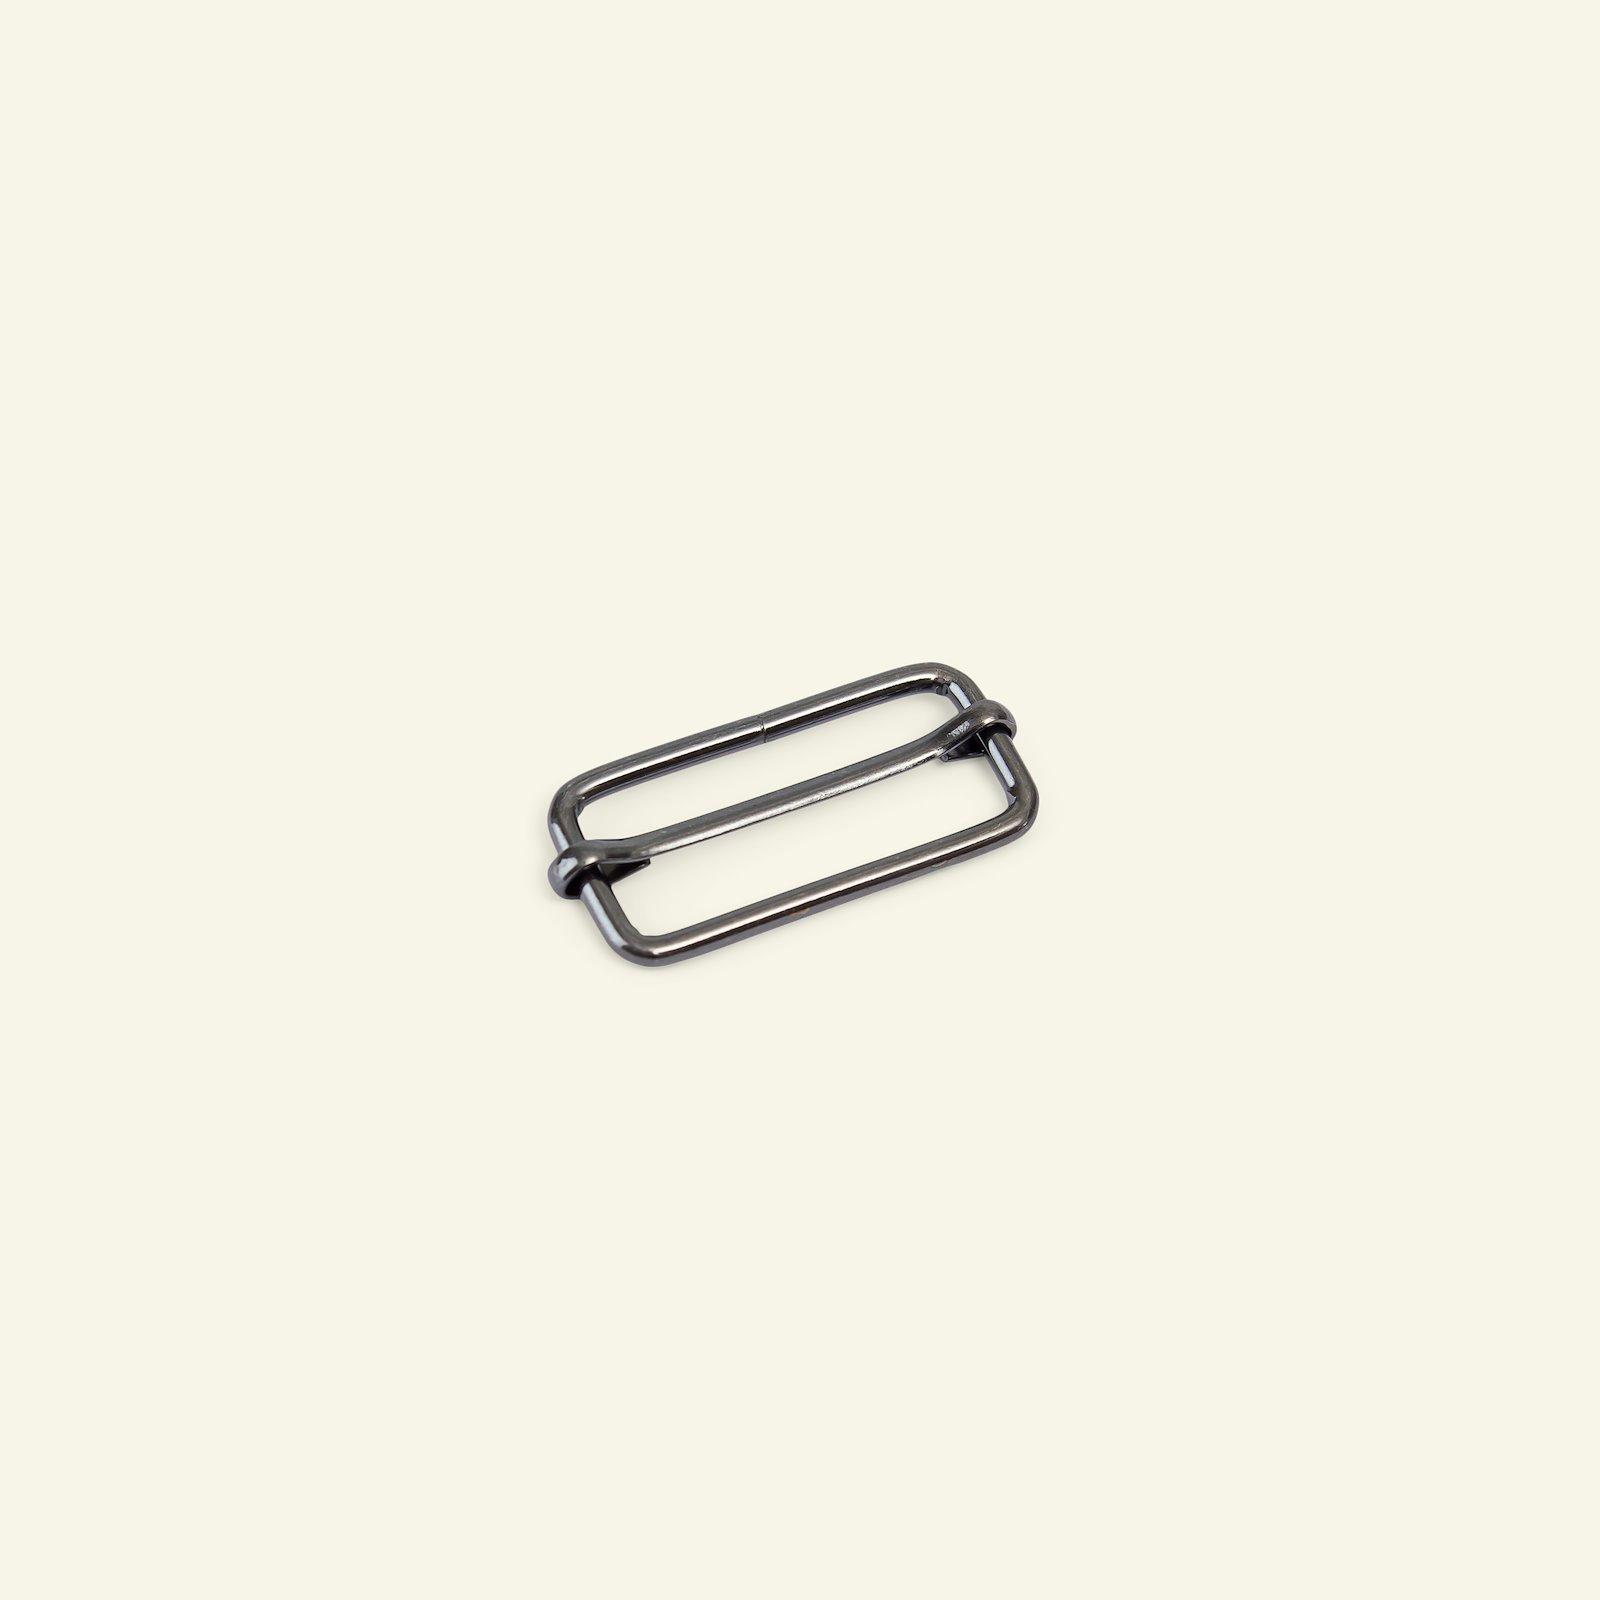 Buckle metal 38x16x3mm dark silver 1pc 45540_pack